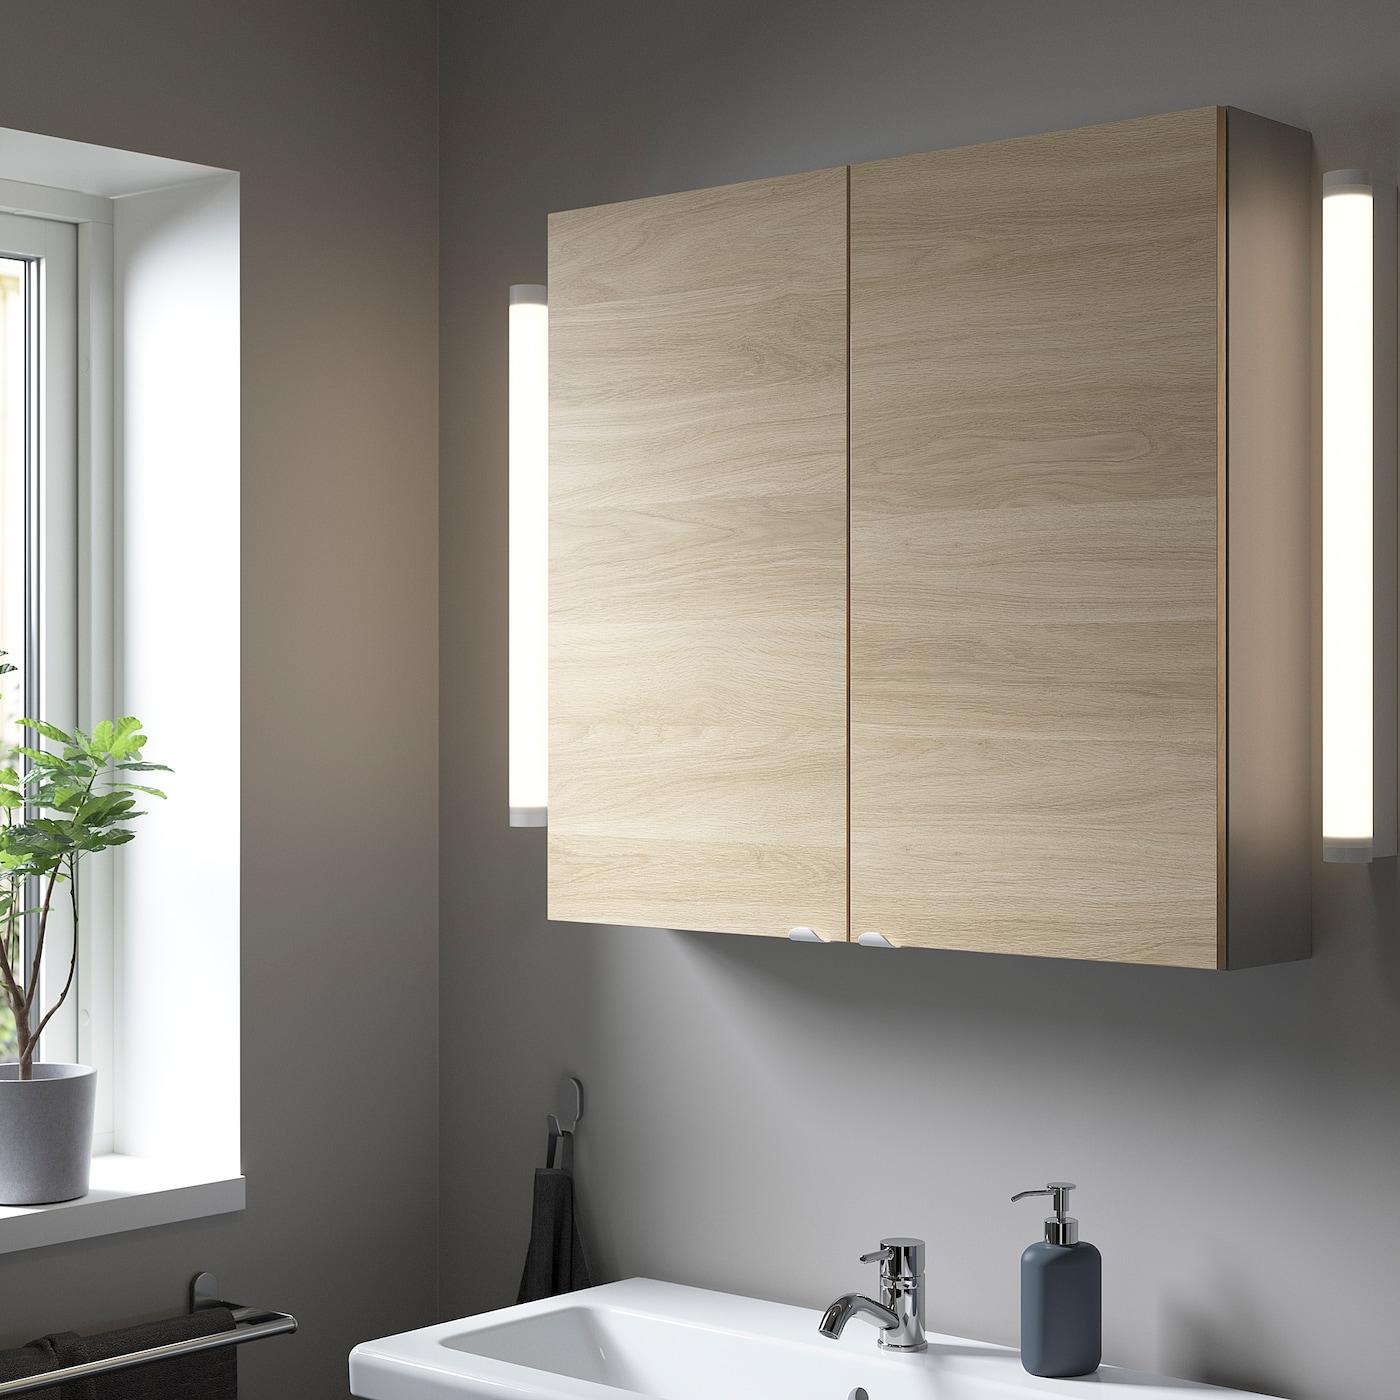 ENHET Wall cb w 2 shlvs/doors, grey/oak effect, 80x17x75 cm